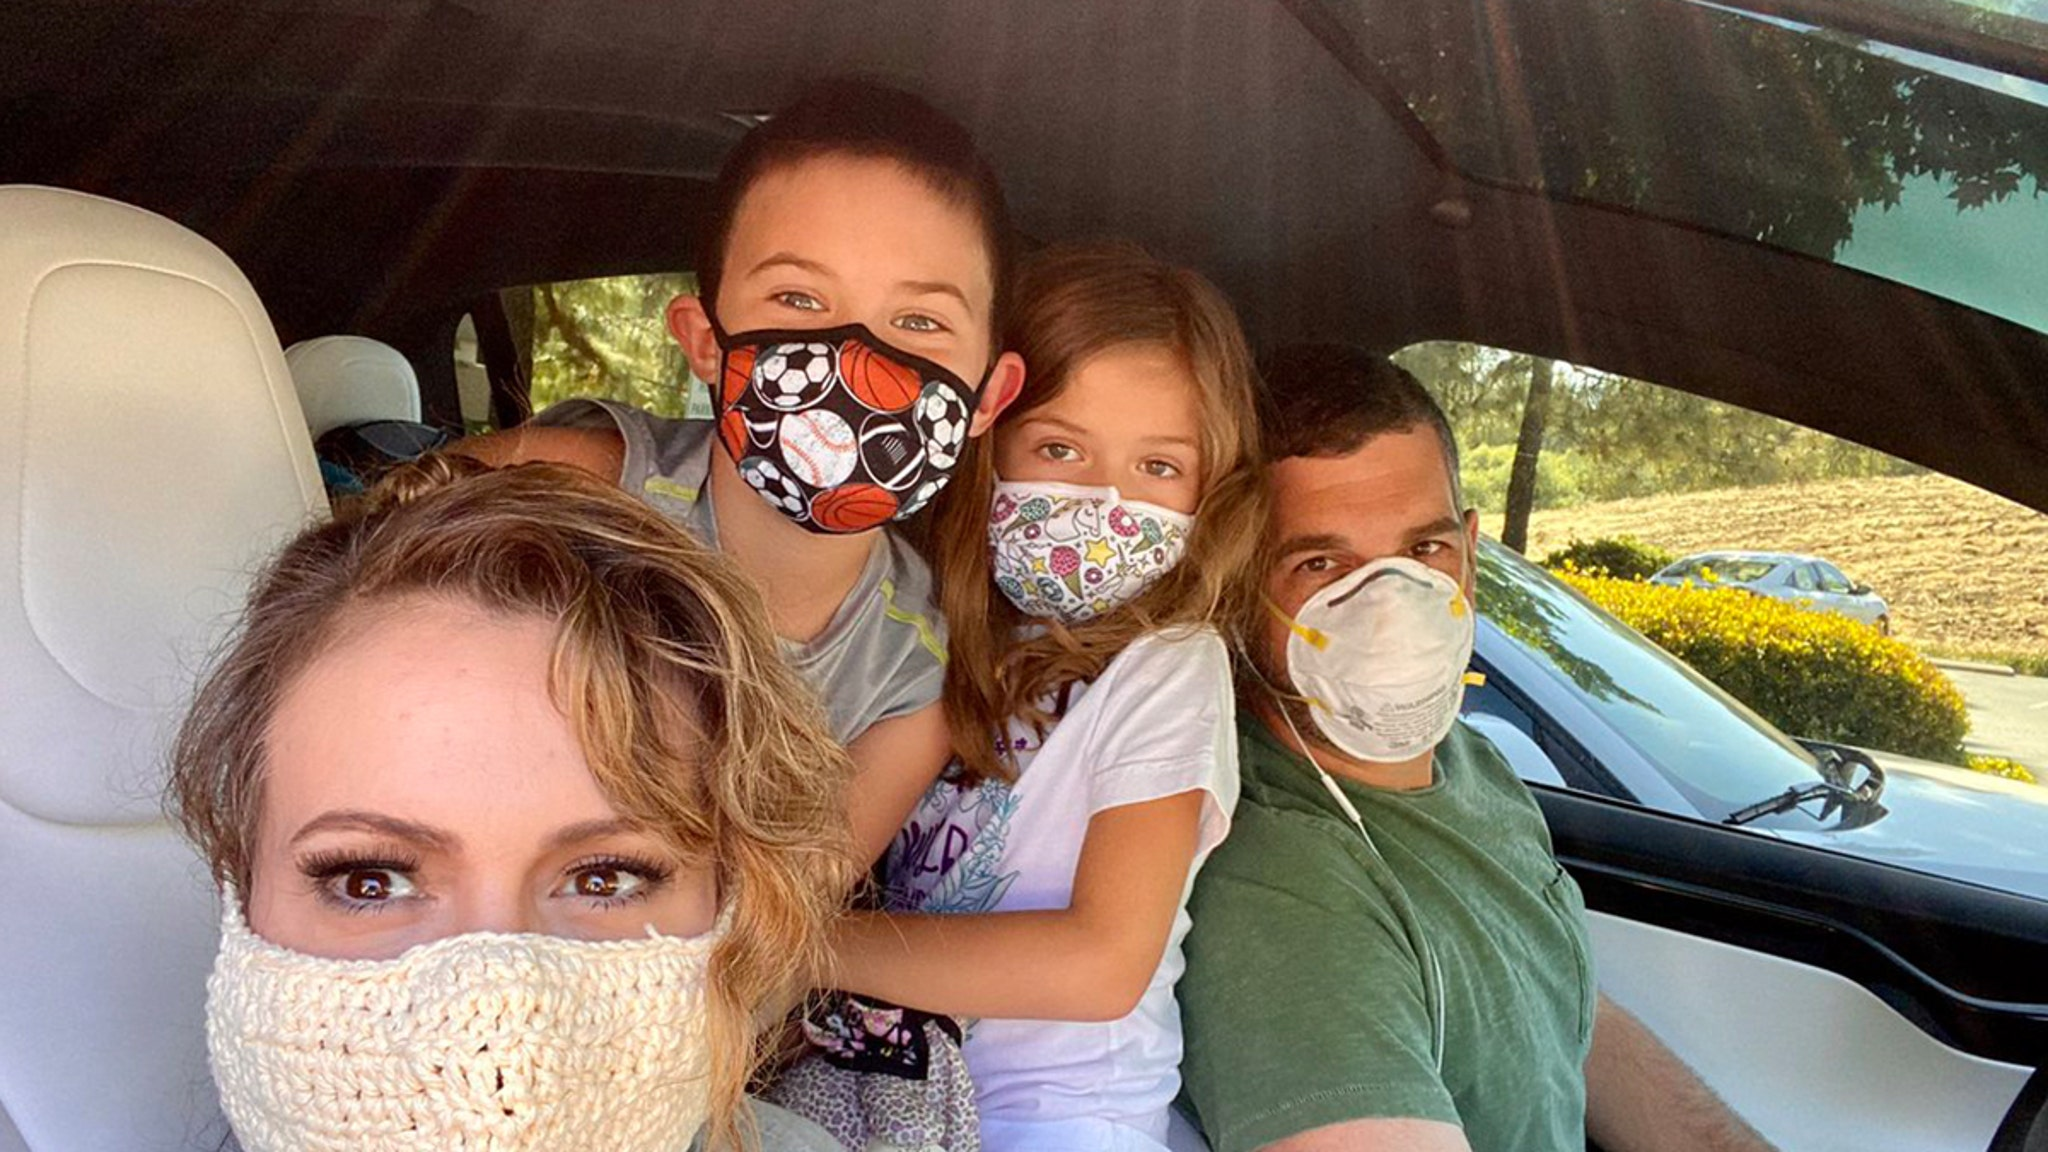 Alyssa Milano Shows Off Crocheted Mask, Notes Filter Inside